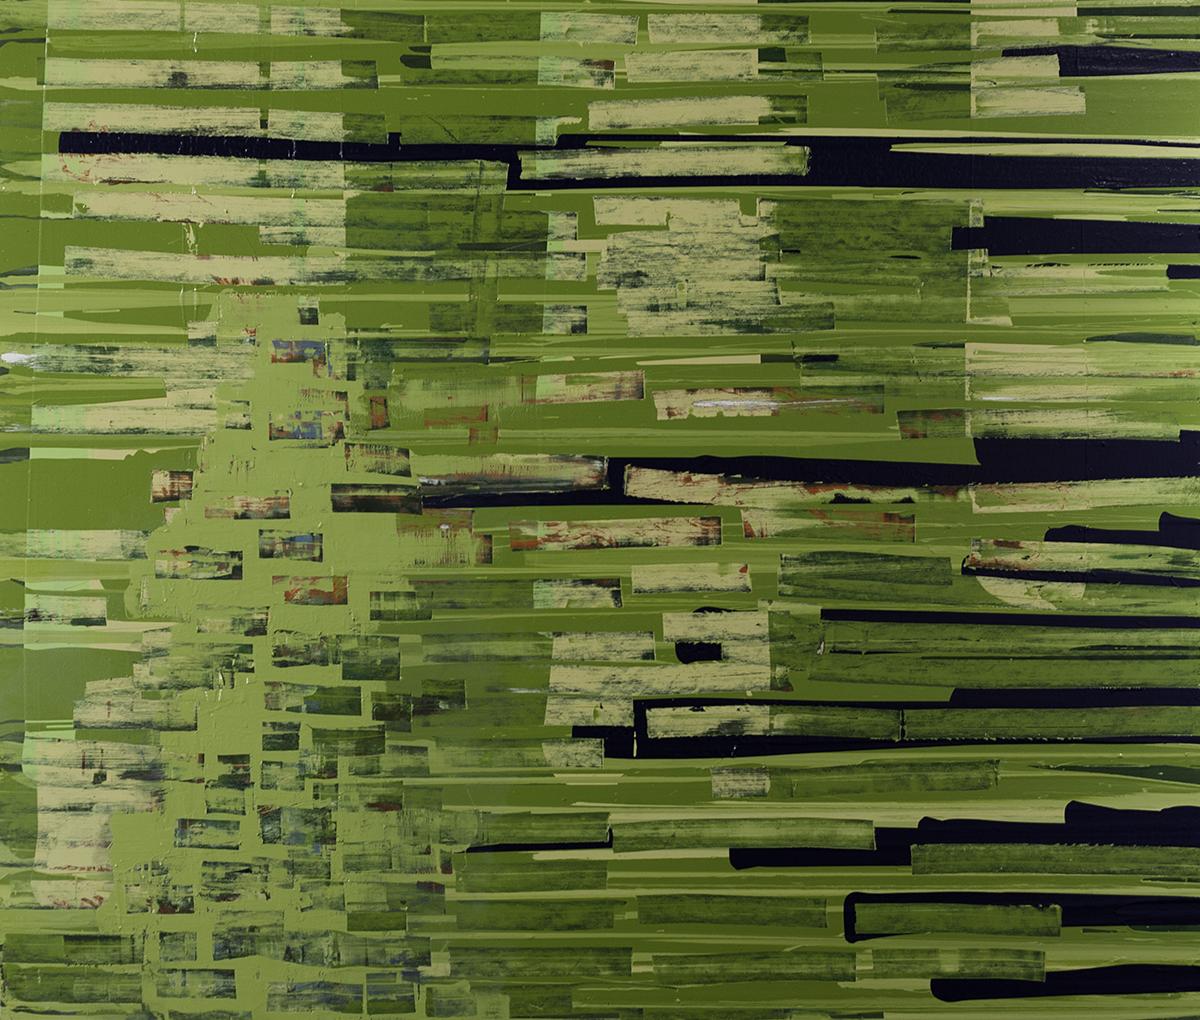 James Behan,  Leeward , oil and enamel on canvas, 6 x 7 feet